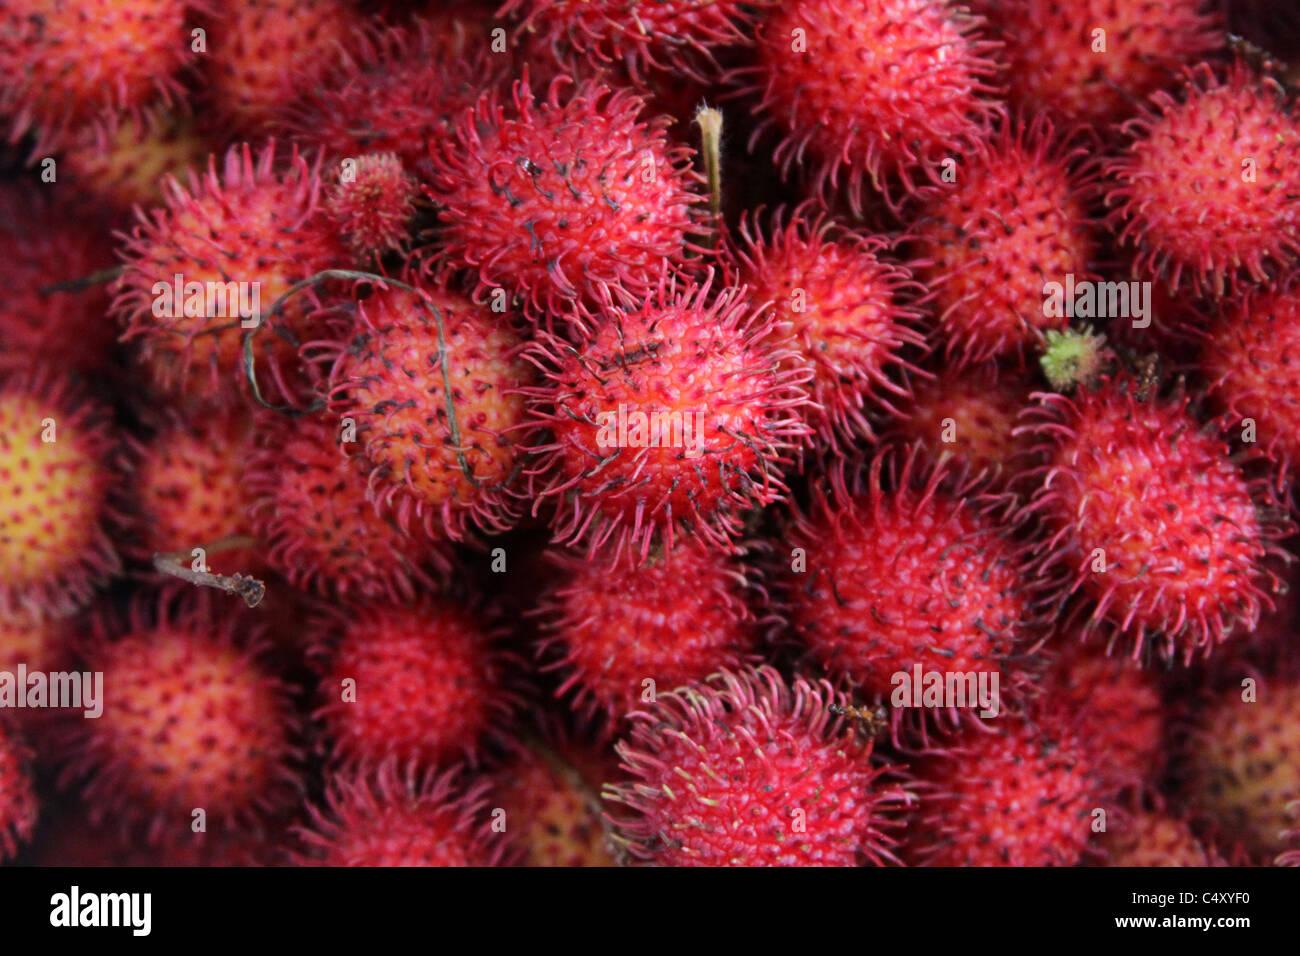 Lychee fruits. - Stock Image